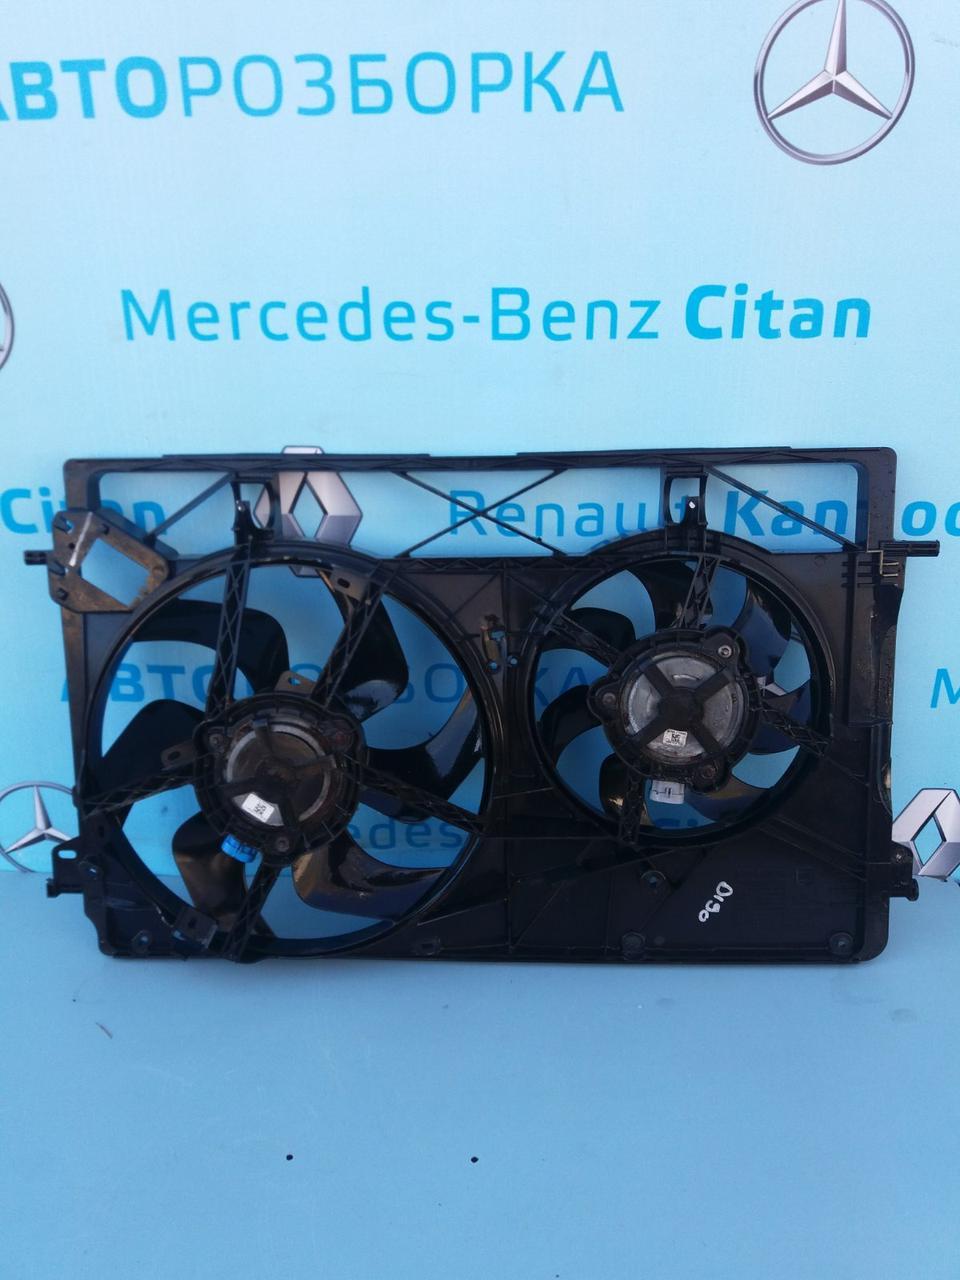 Диффузор 214816680r с вентиляторами для Рено Трафик 3 Renault Trafic 2014-2019 г. в.